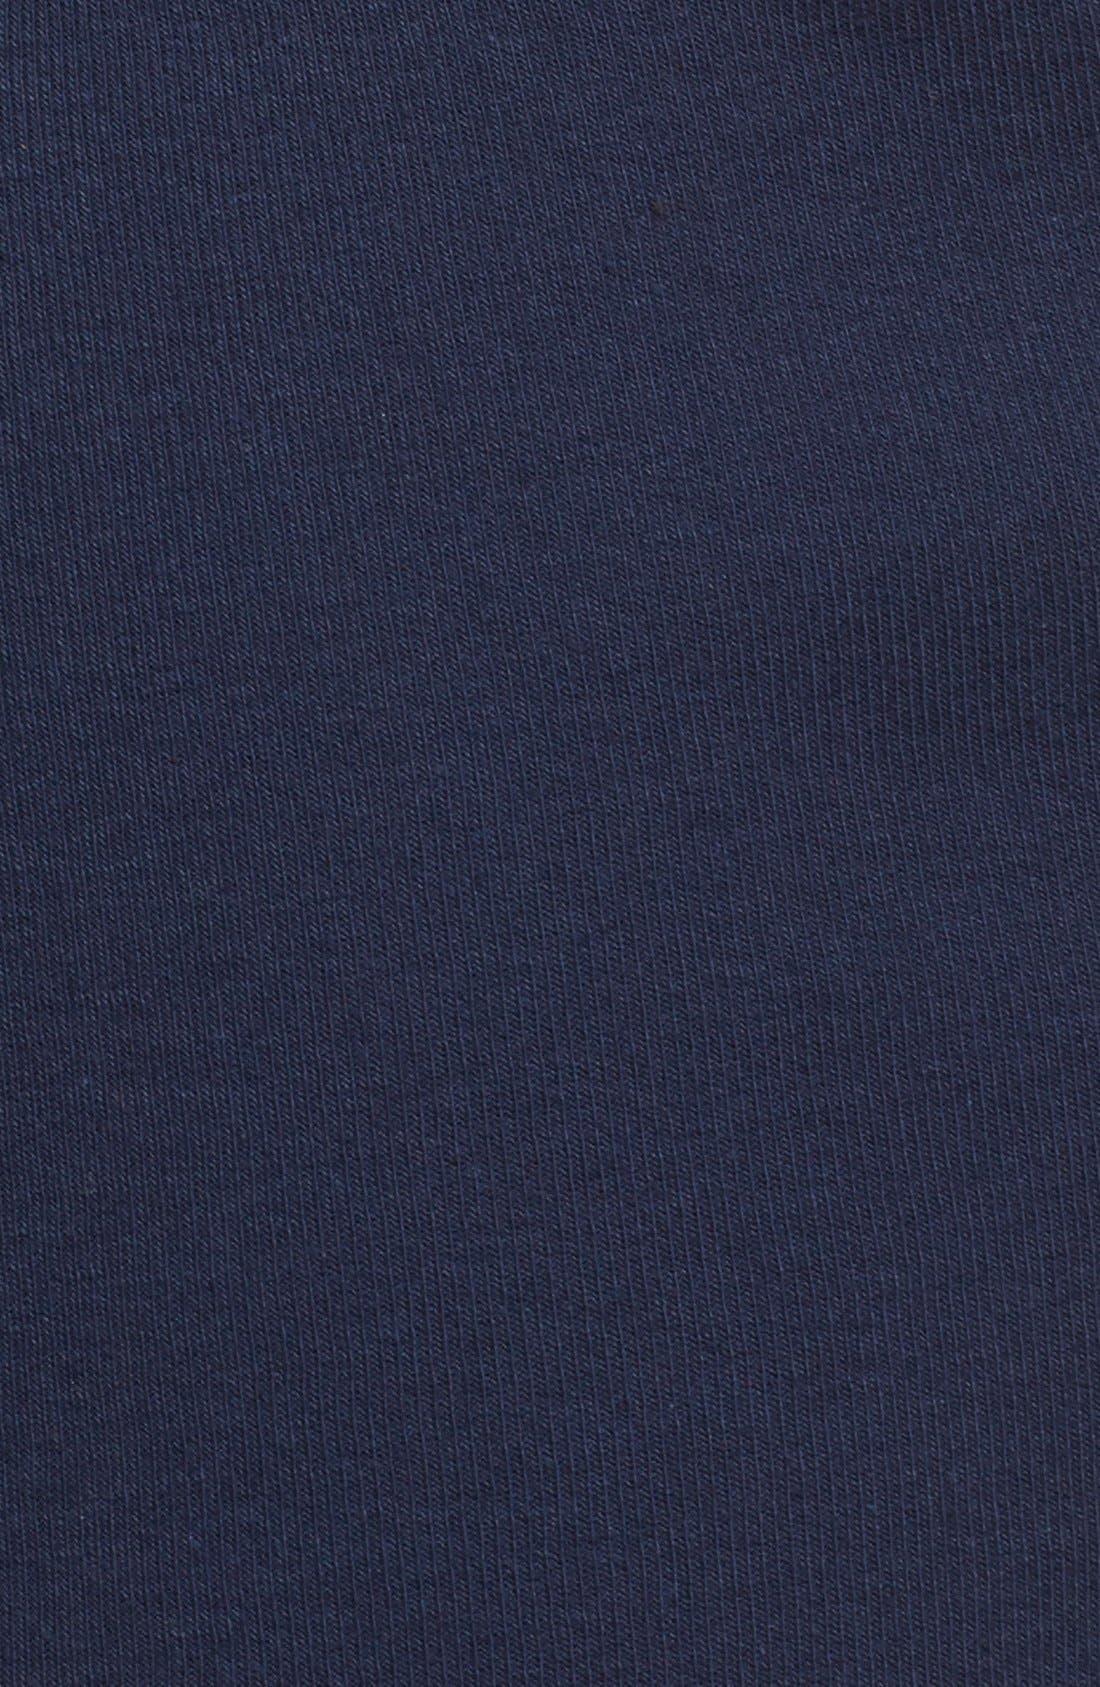 3-Pack Cotton Trunks,                             Alternate thumbnail 5, color,                             Cruise Navy/ Blue